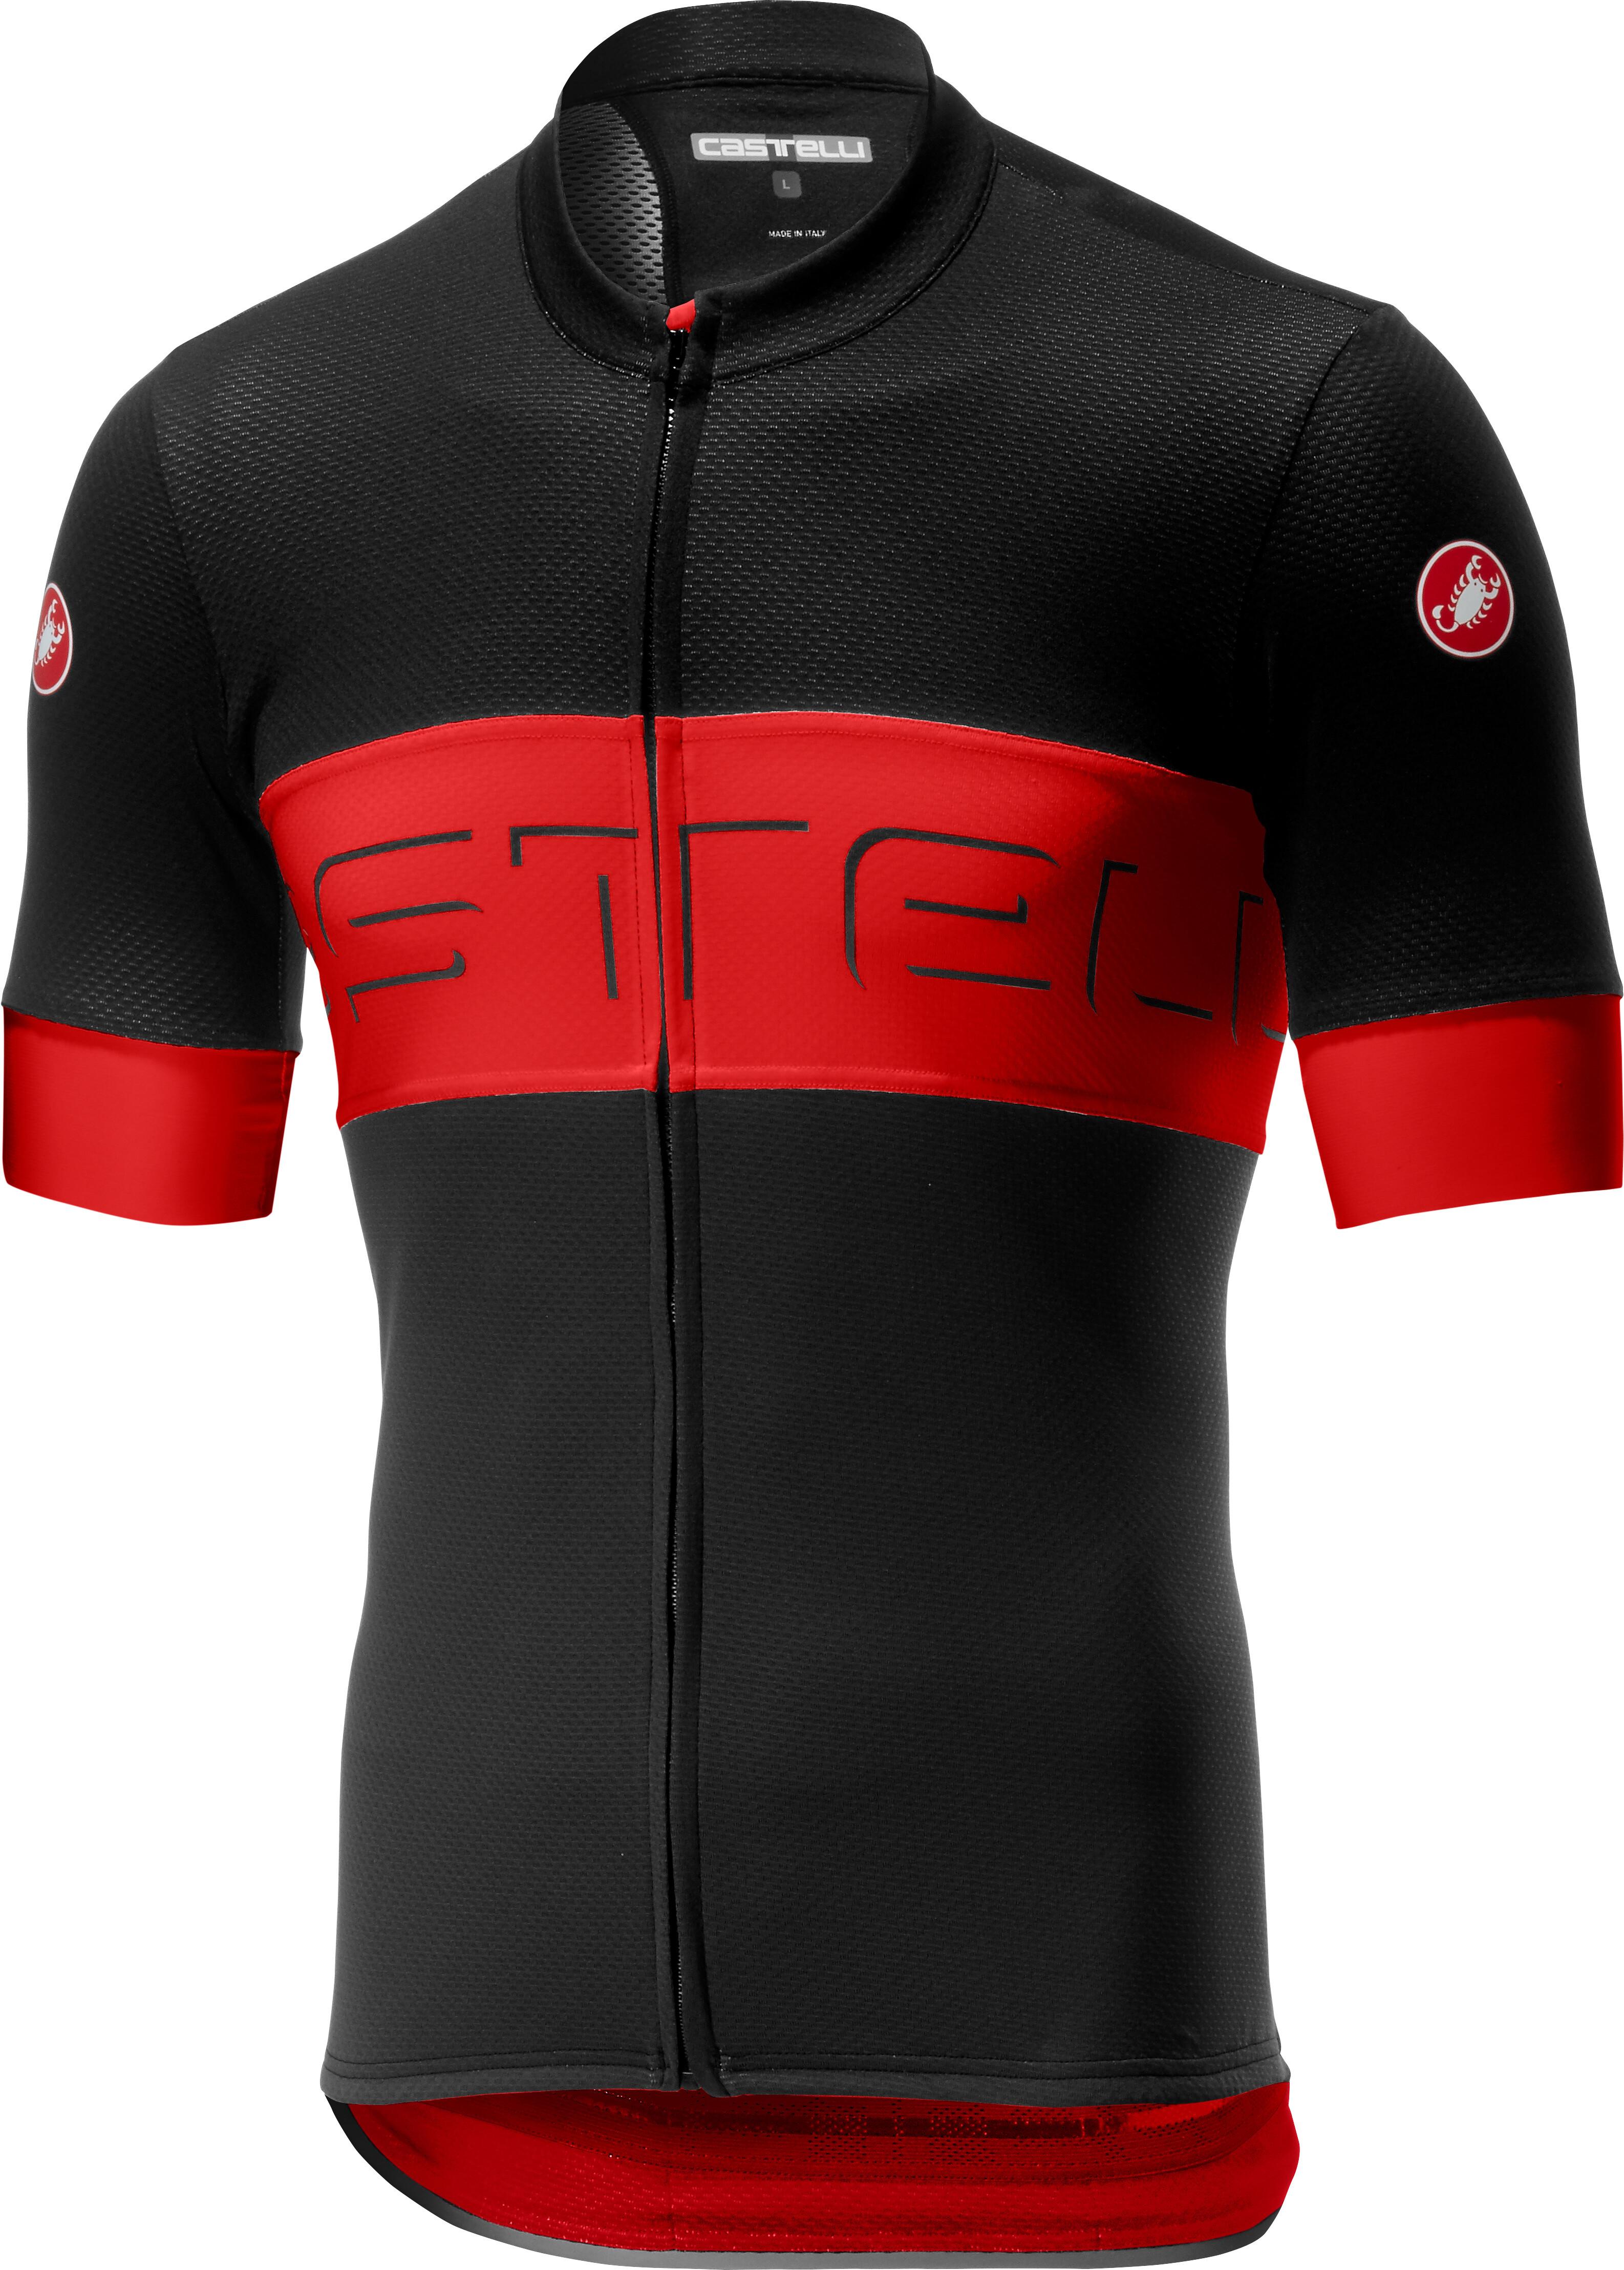 df3d178cb Castelli Prologo VI Bike Jersey Shortsleeve Men red black at ...